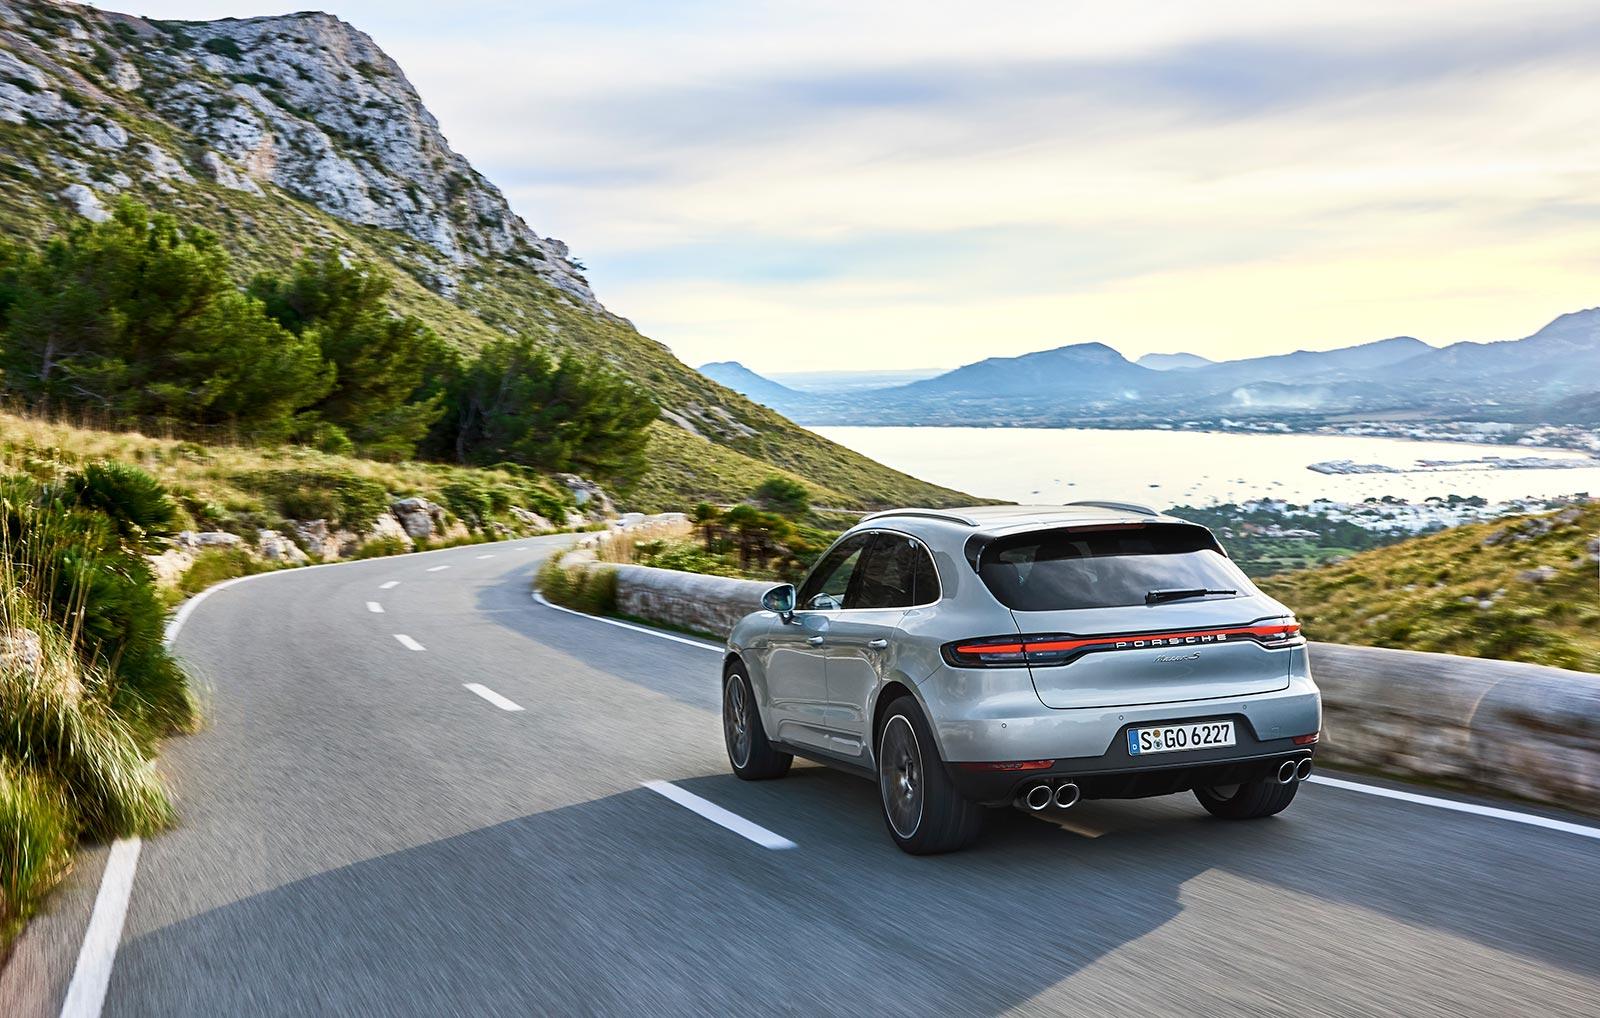 Porsche Macan S - The Ducker